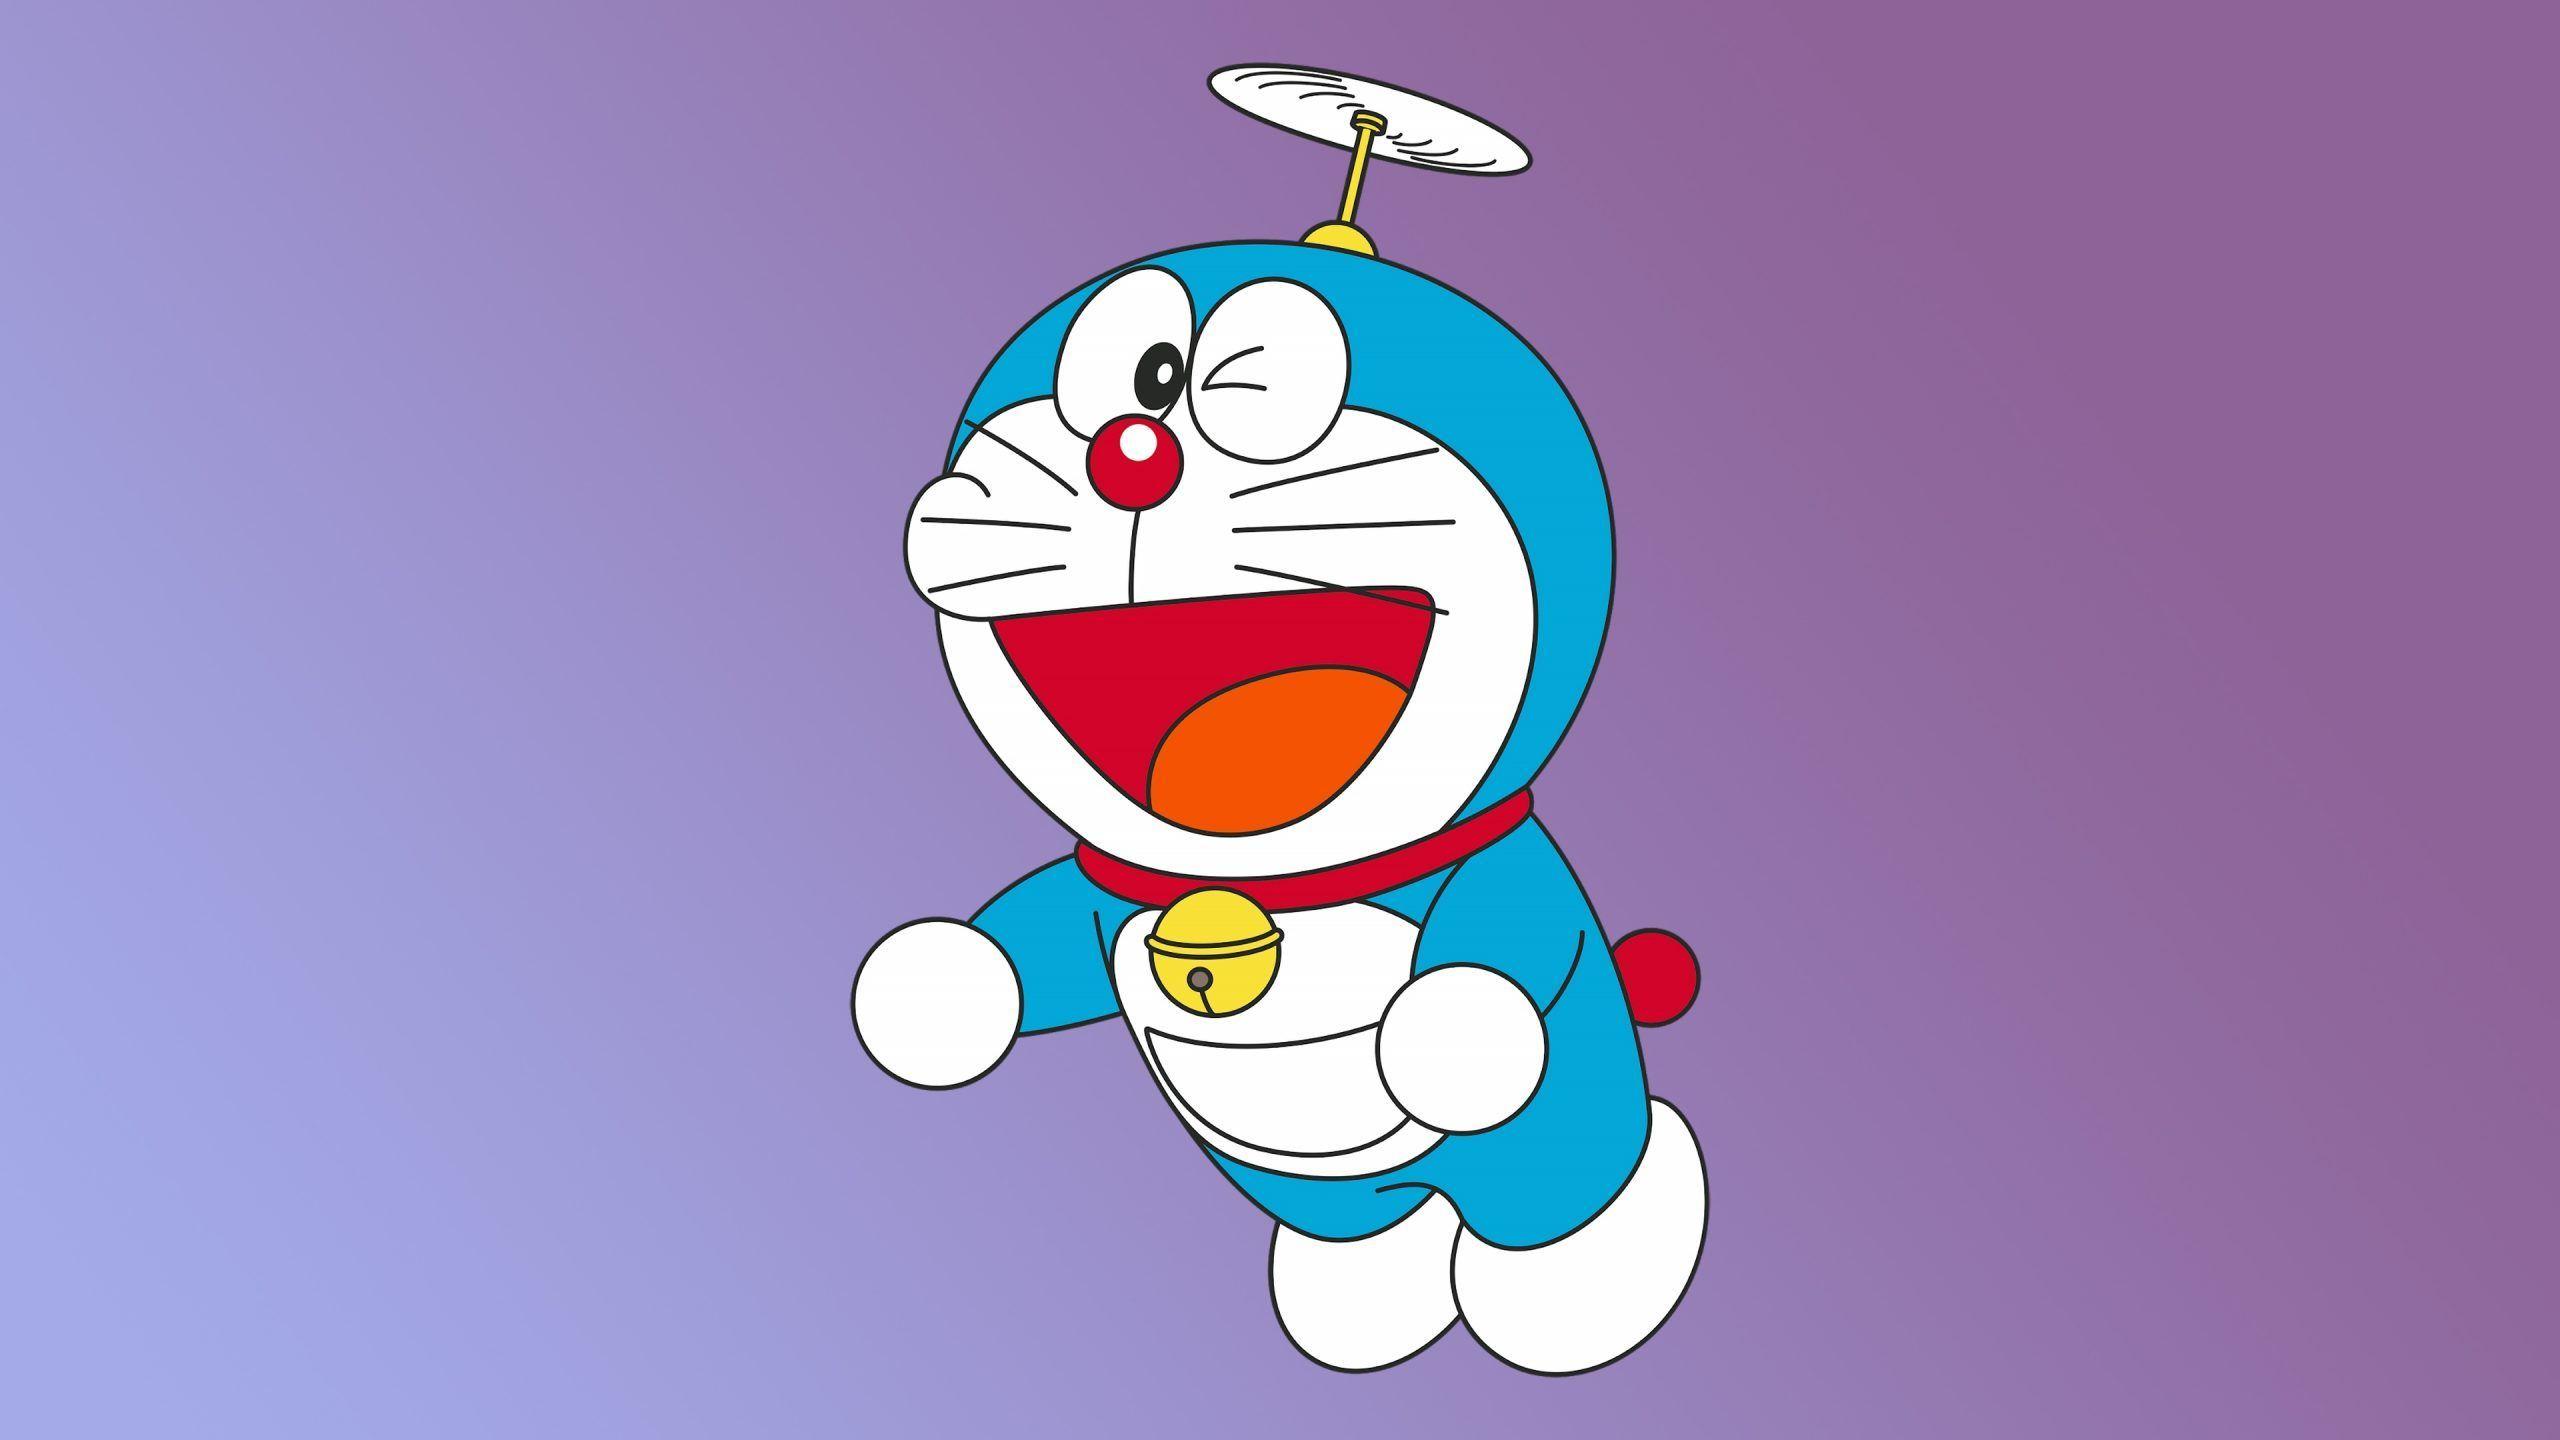 Aesthetic Cute Doraemon And Nobita Wallpaper Hd Doraemon In 2021 Cartoon Wallpaper Hd Doraemon Wallpaper Hd Cute Wallpapers Cute doraemon wallpaper doraemon pictures